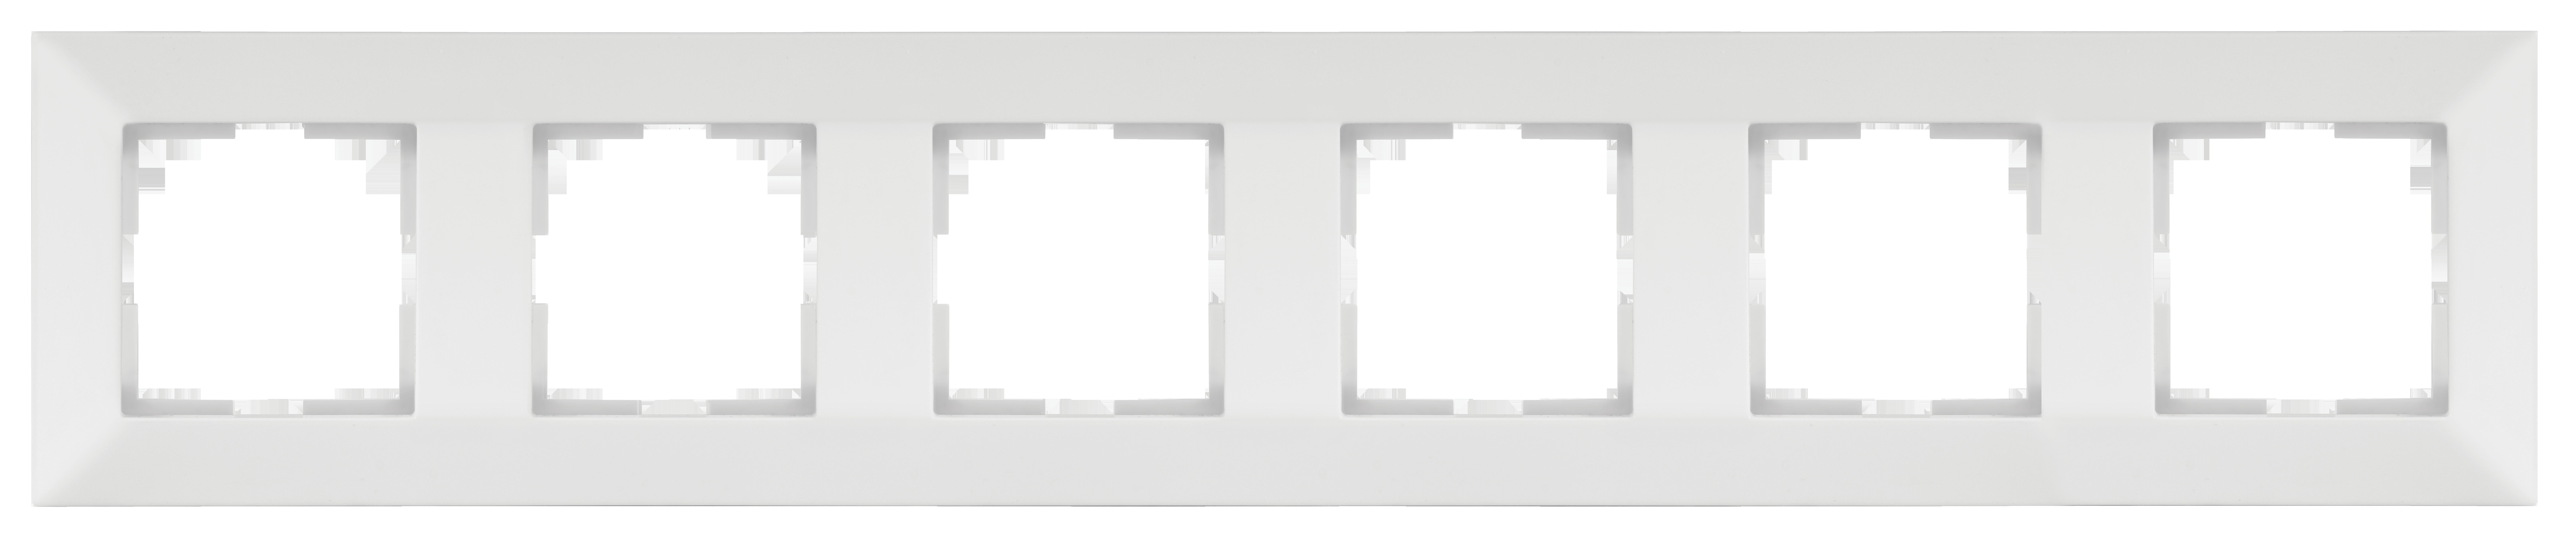 Meridian 6-gang frame